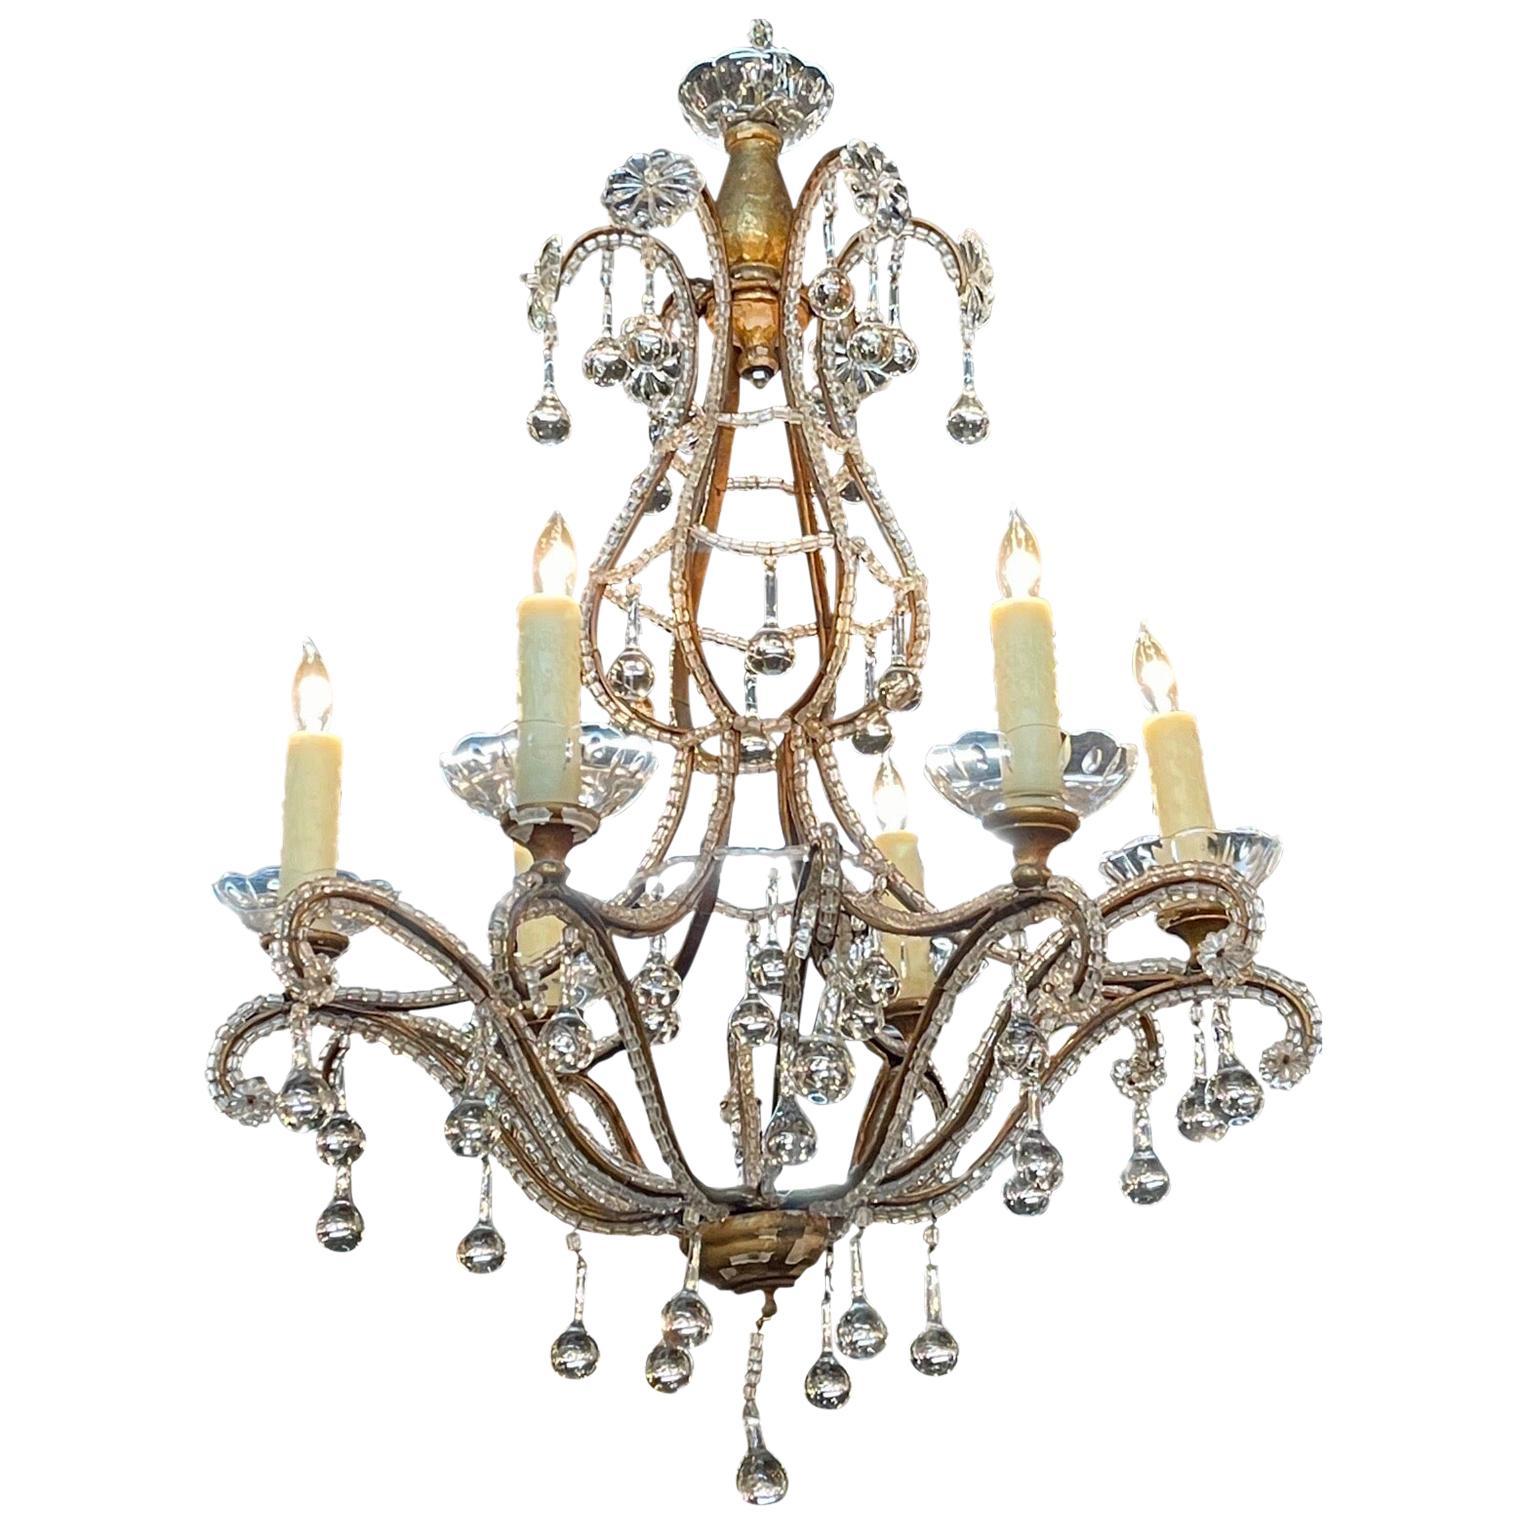 Antique Italian Beaded Crystal 6-Light Chandeliers